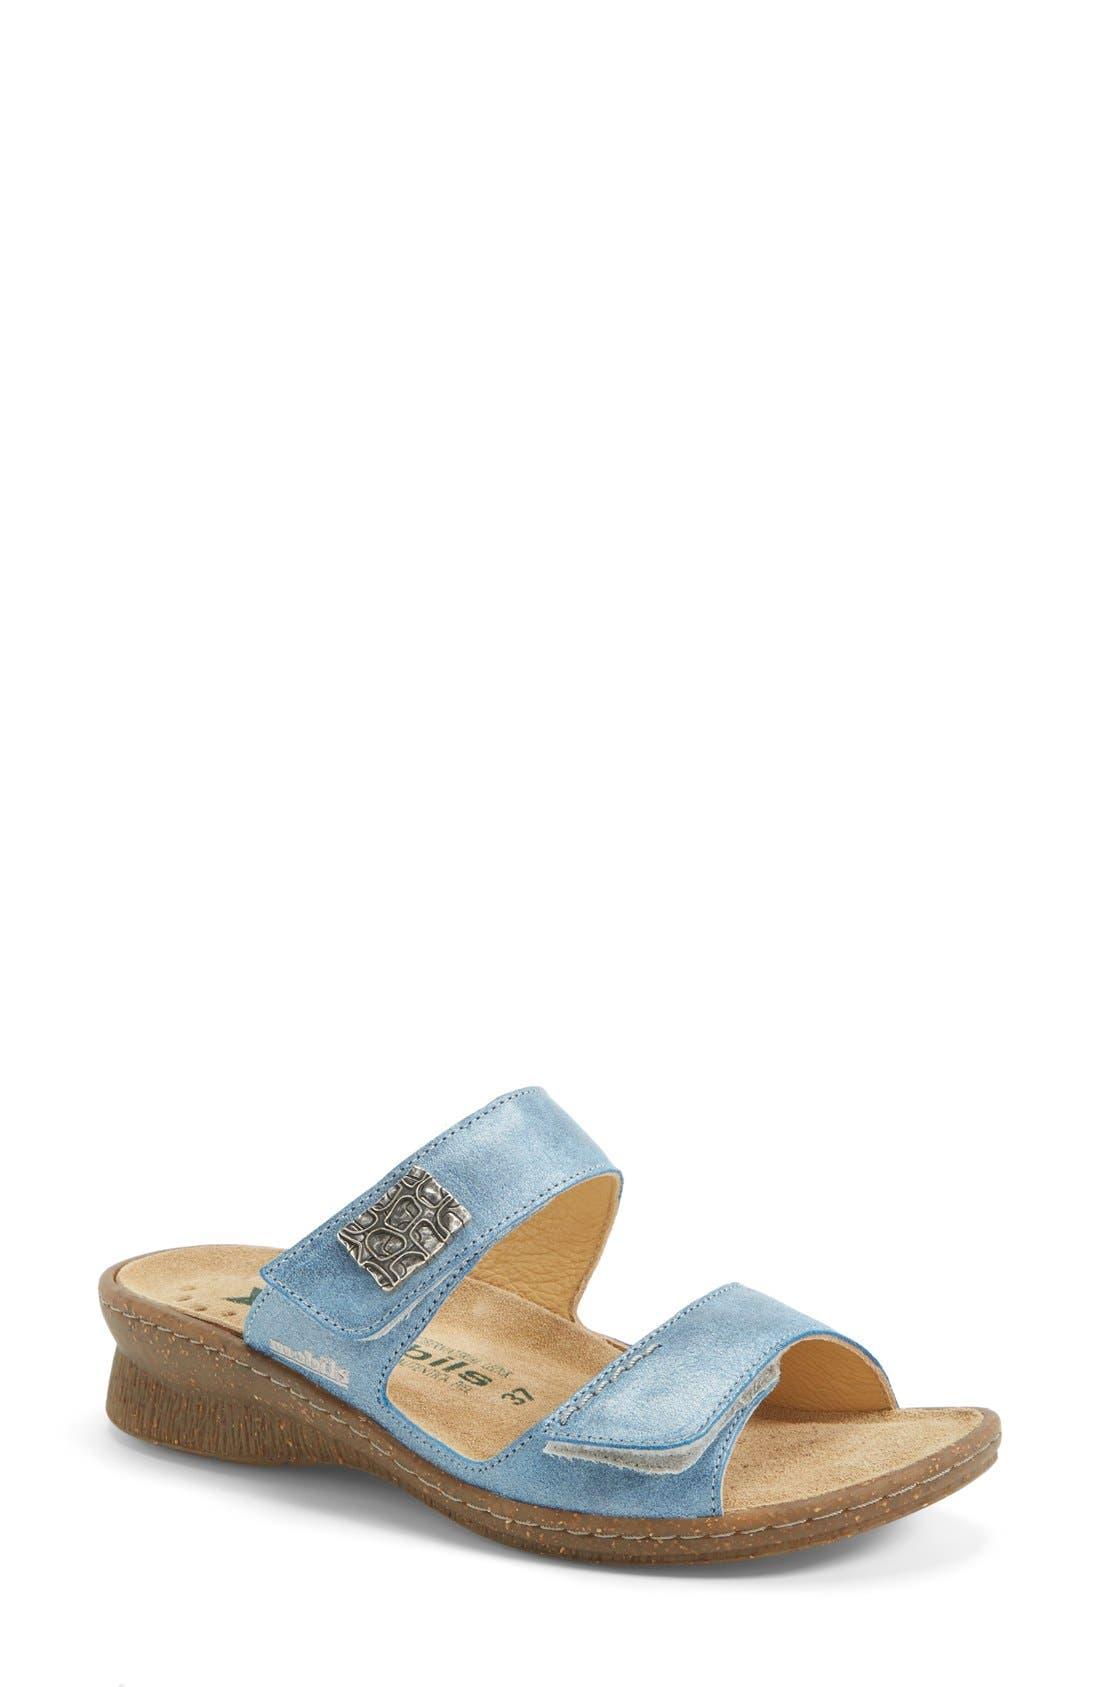 'Bregalia' Metallic Leather Sandal,                             Main thumbnail 1, color,                             400